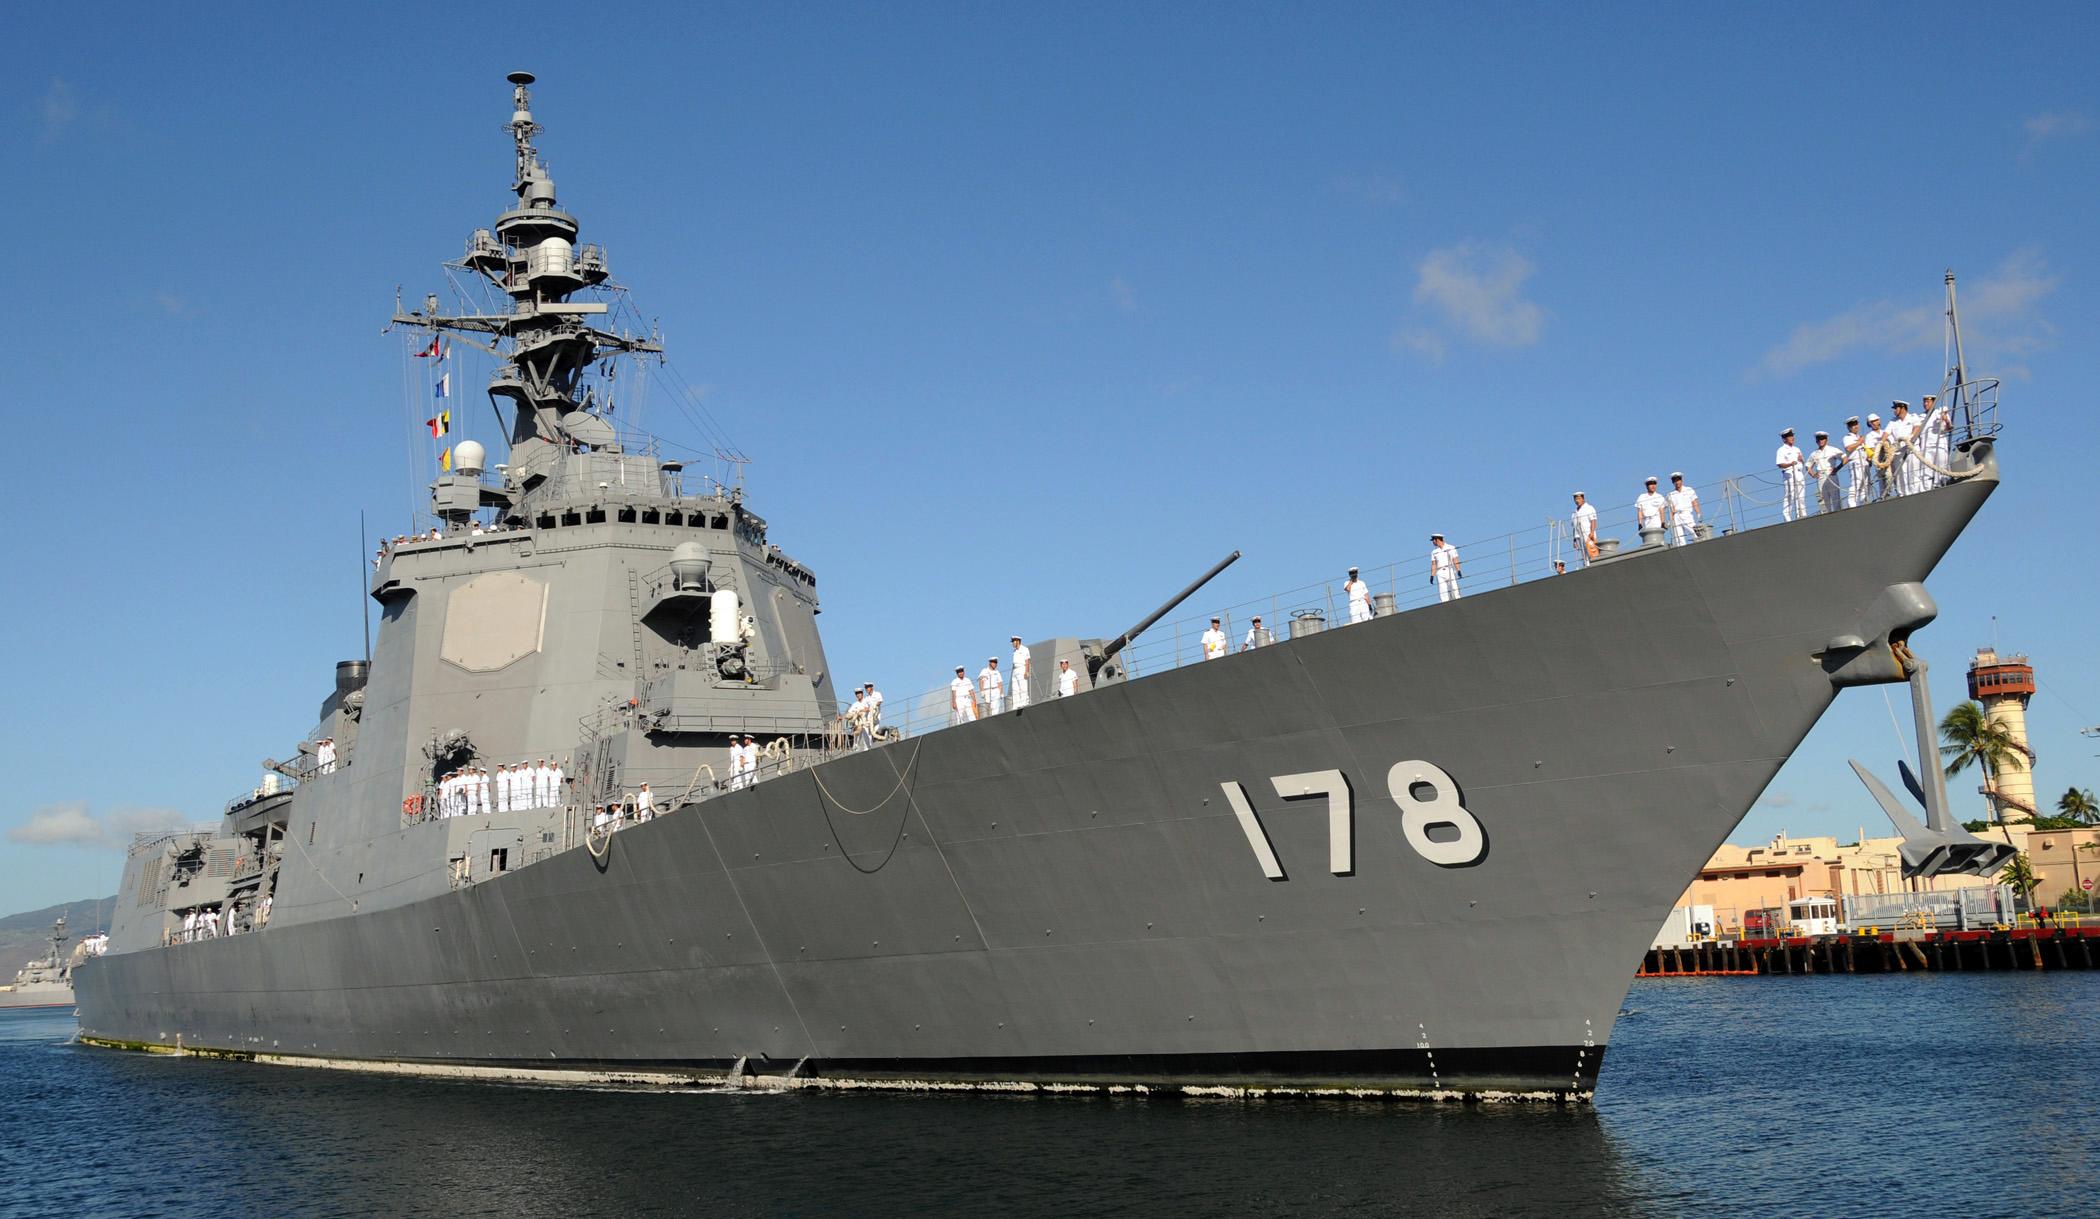 File:JS Ashigara, DDG-178 at Naval Station Pearl Harbor.jpg